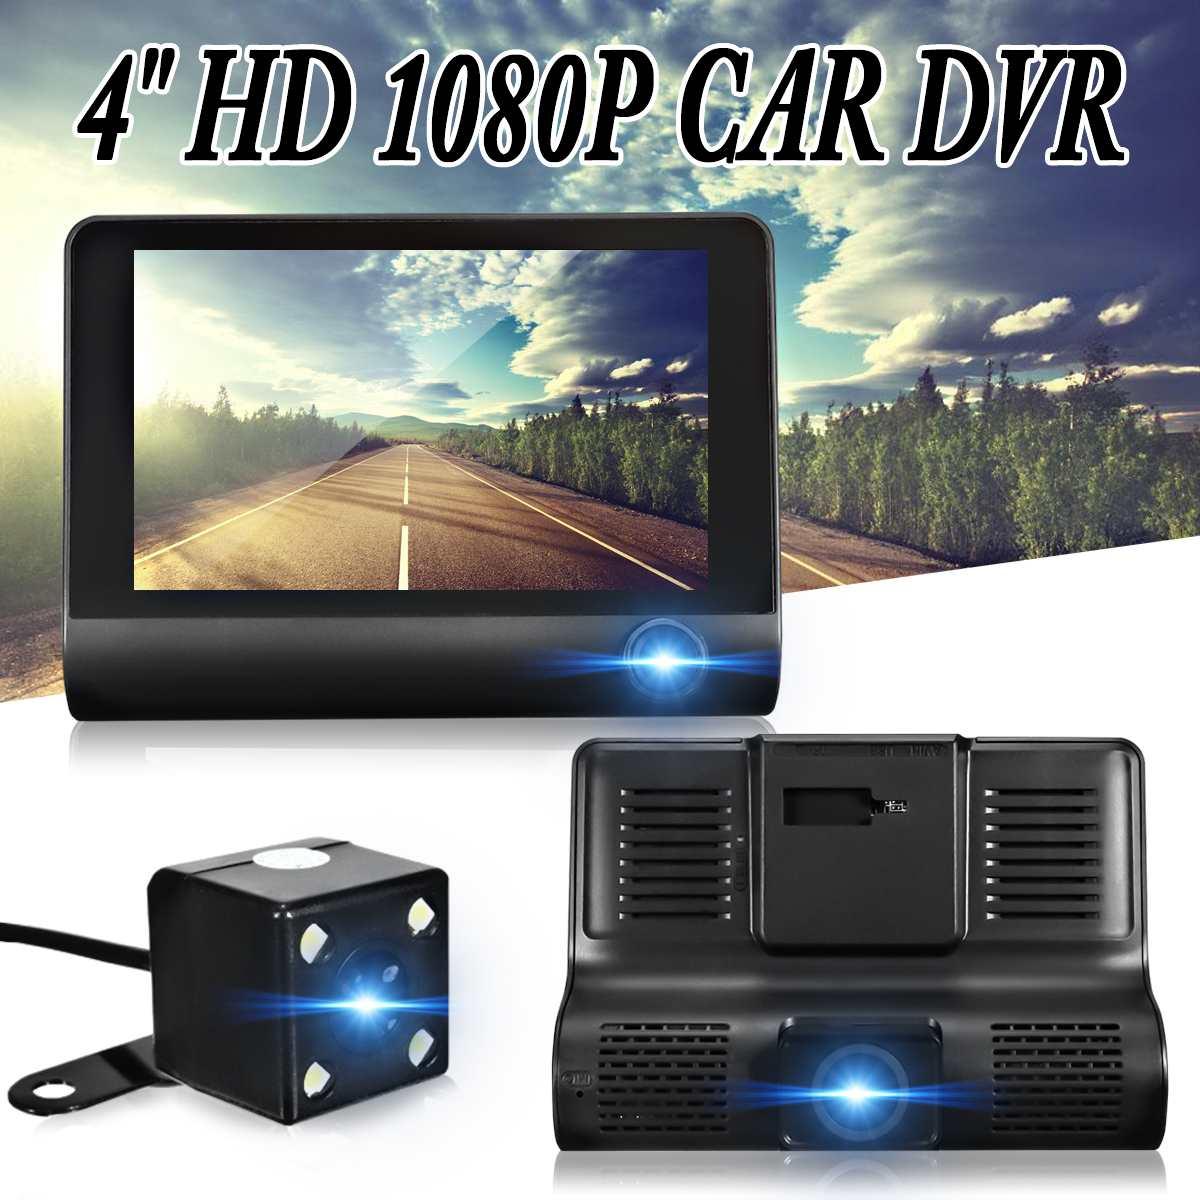 KROAK DVR Dash-Cam Camera Video-Recorder Rearview G-Sensor Dual-Lens 170-Degree Full-Hd